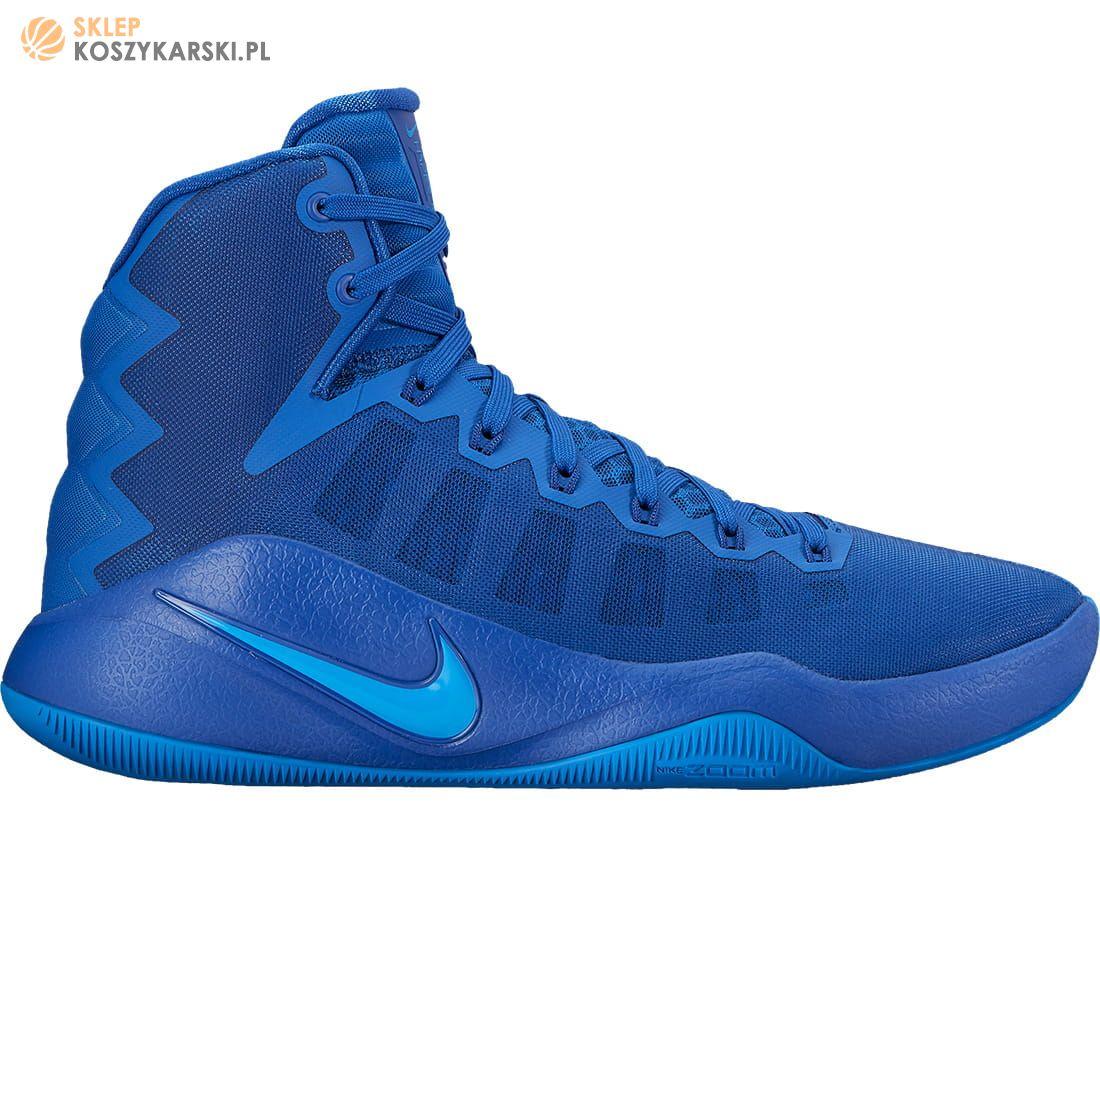 Buty Do Koszykowki Nike Hyperdunk 2016 Blue 844359 440 Sklepkoszykarski Pl